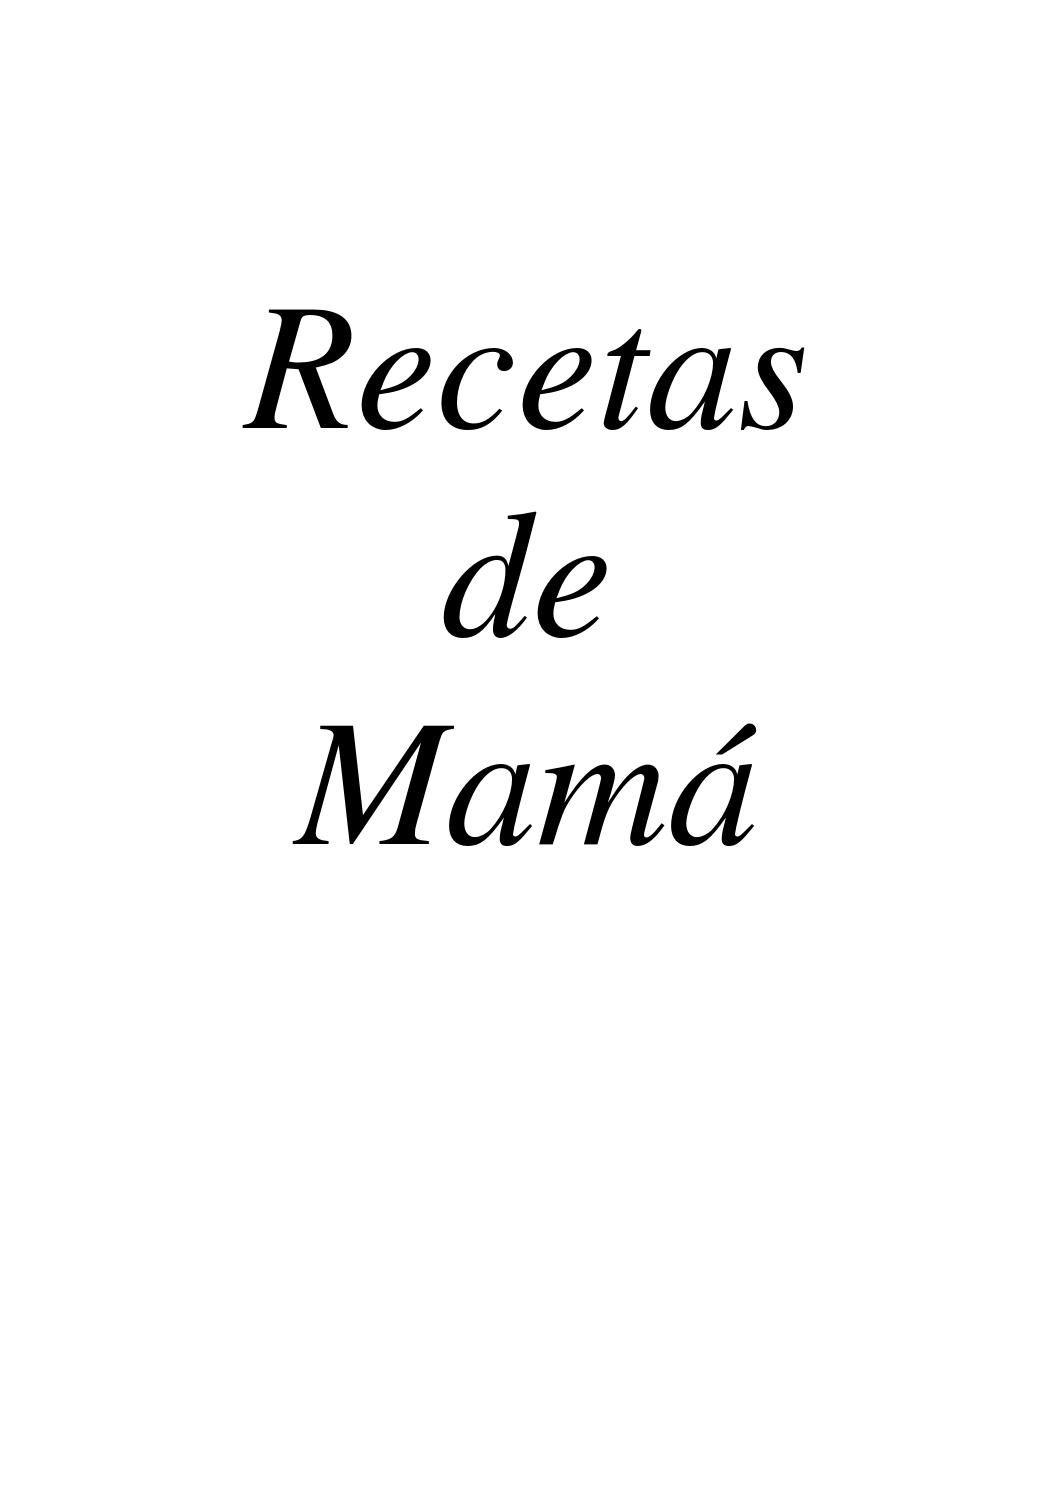 6c2bd8d6b90de201bc898453a4e58867 - Las Recetas De Mama